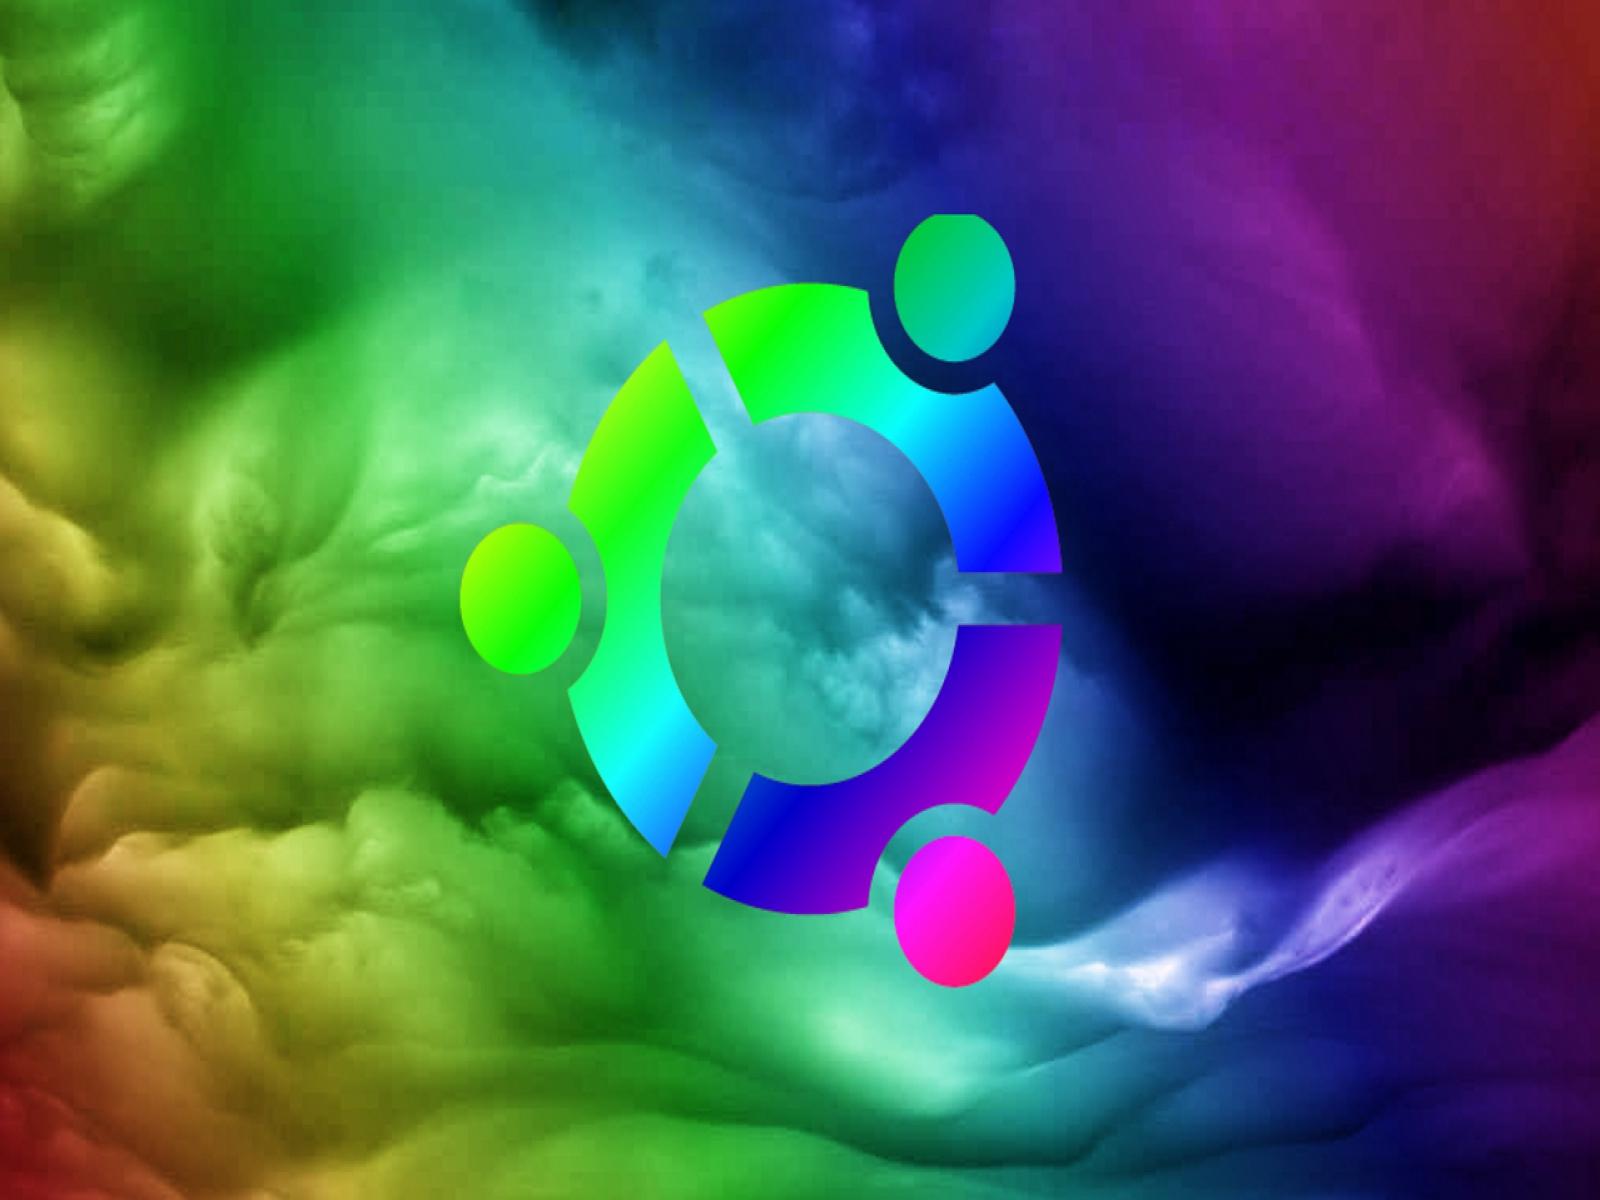 http://4.bp.blogspot.com/-1kGKBL7Eopw/USjQr4ely2I/AAAAAAAAASc/EBgh-yP37z4/s1600/1+-+Ubuntu+Rainbow.jpg